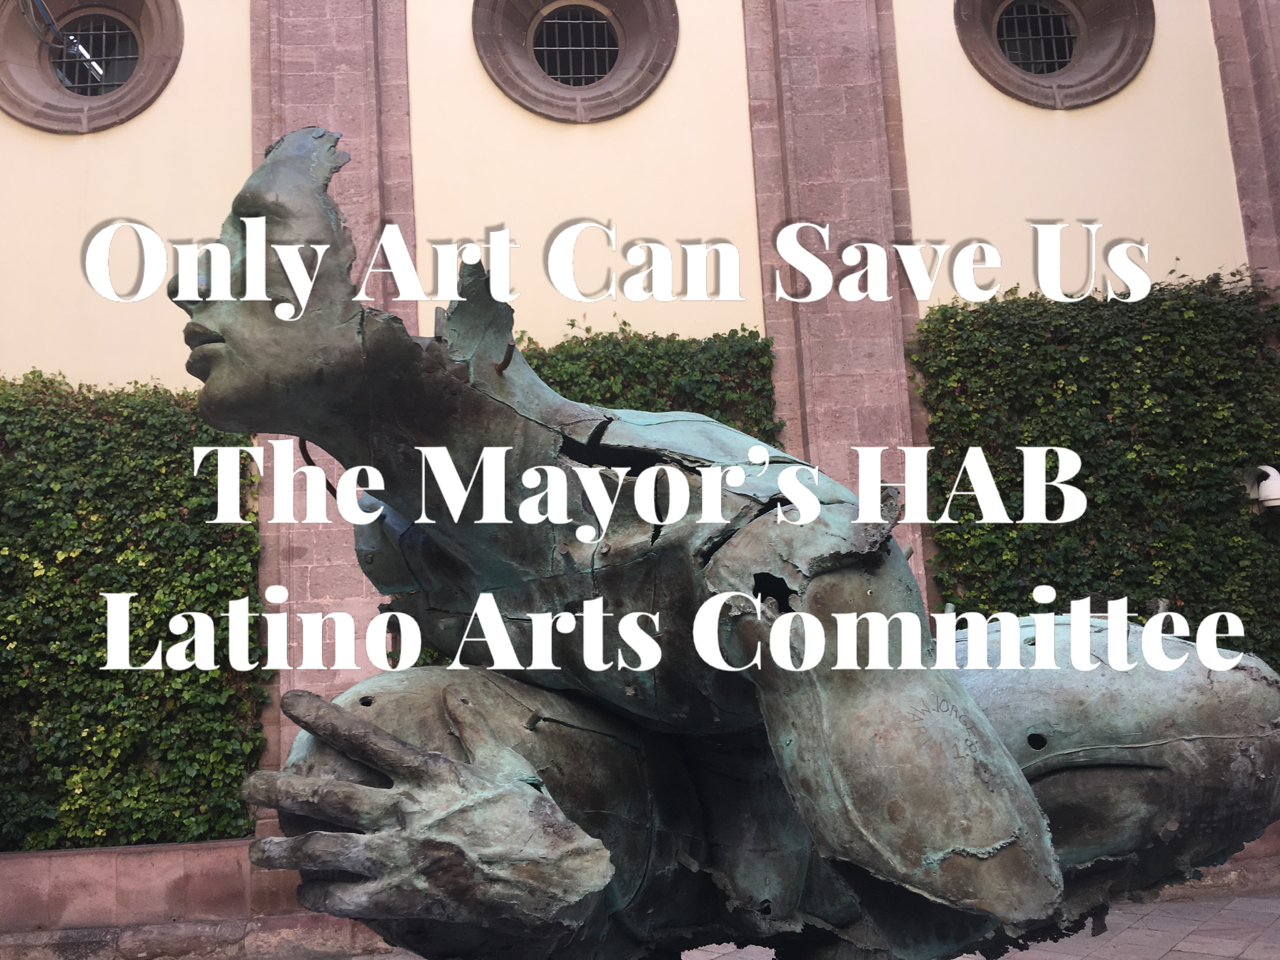 Houston Mayor's Hispanic Advisory Board Latino Arts Committee